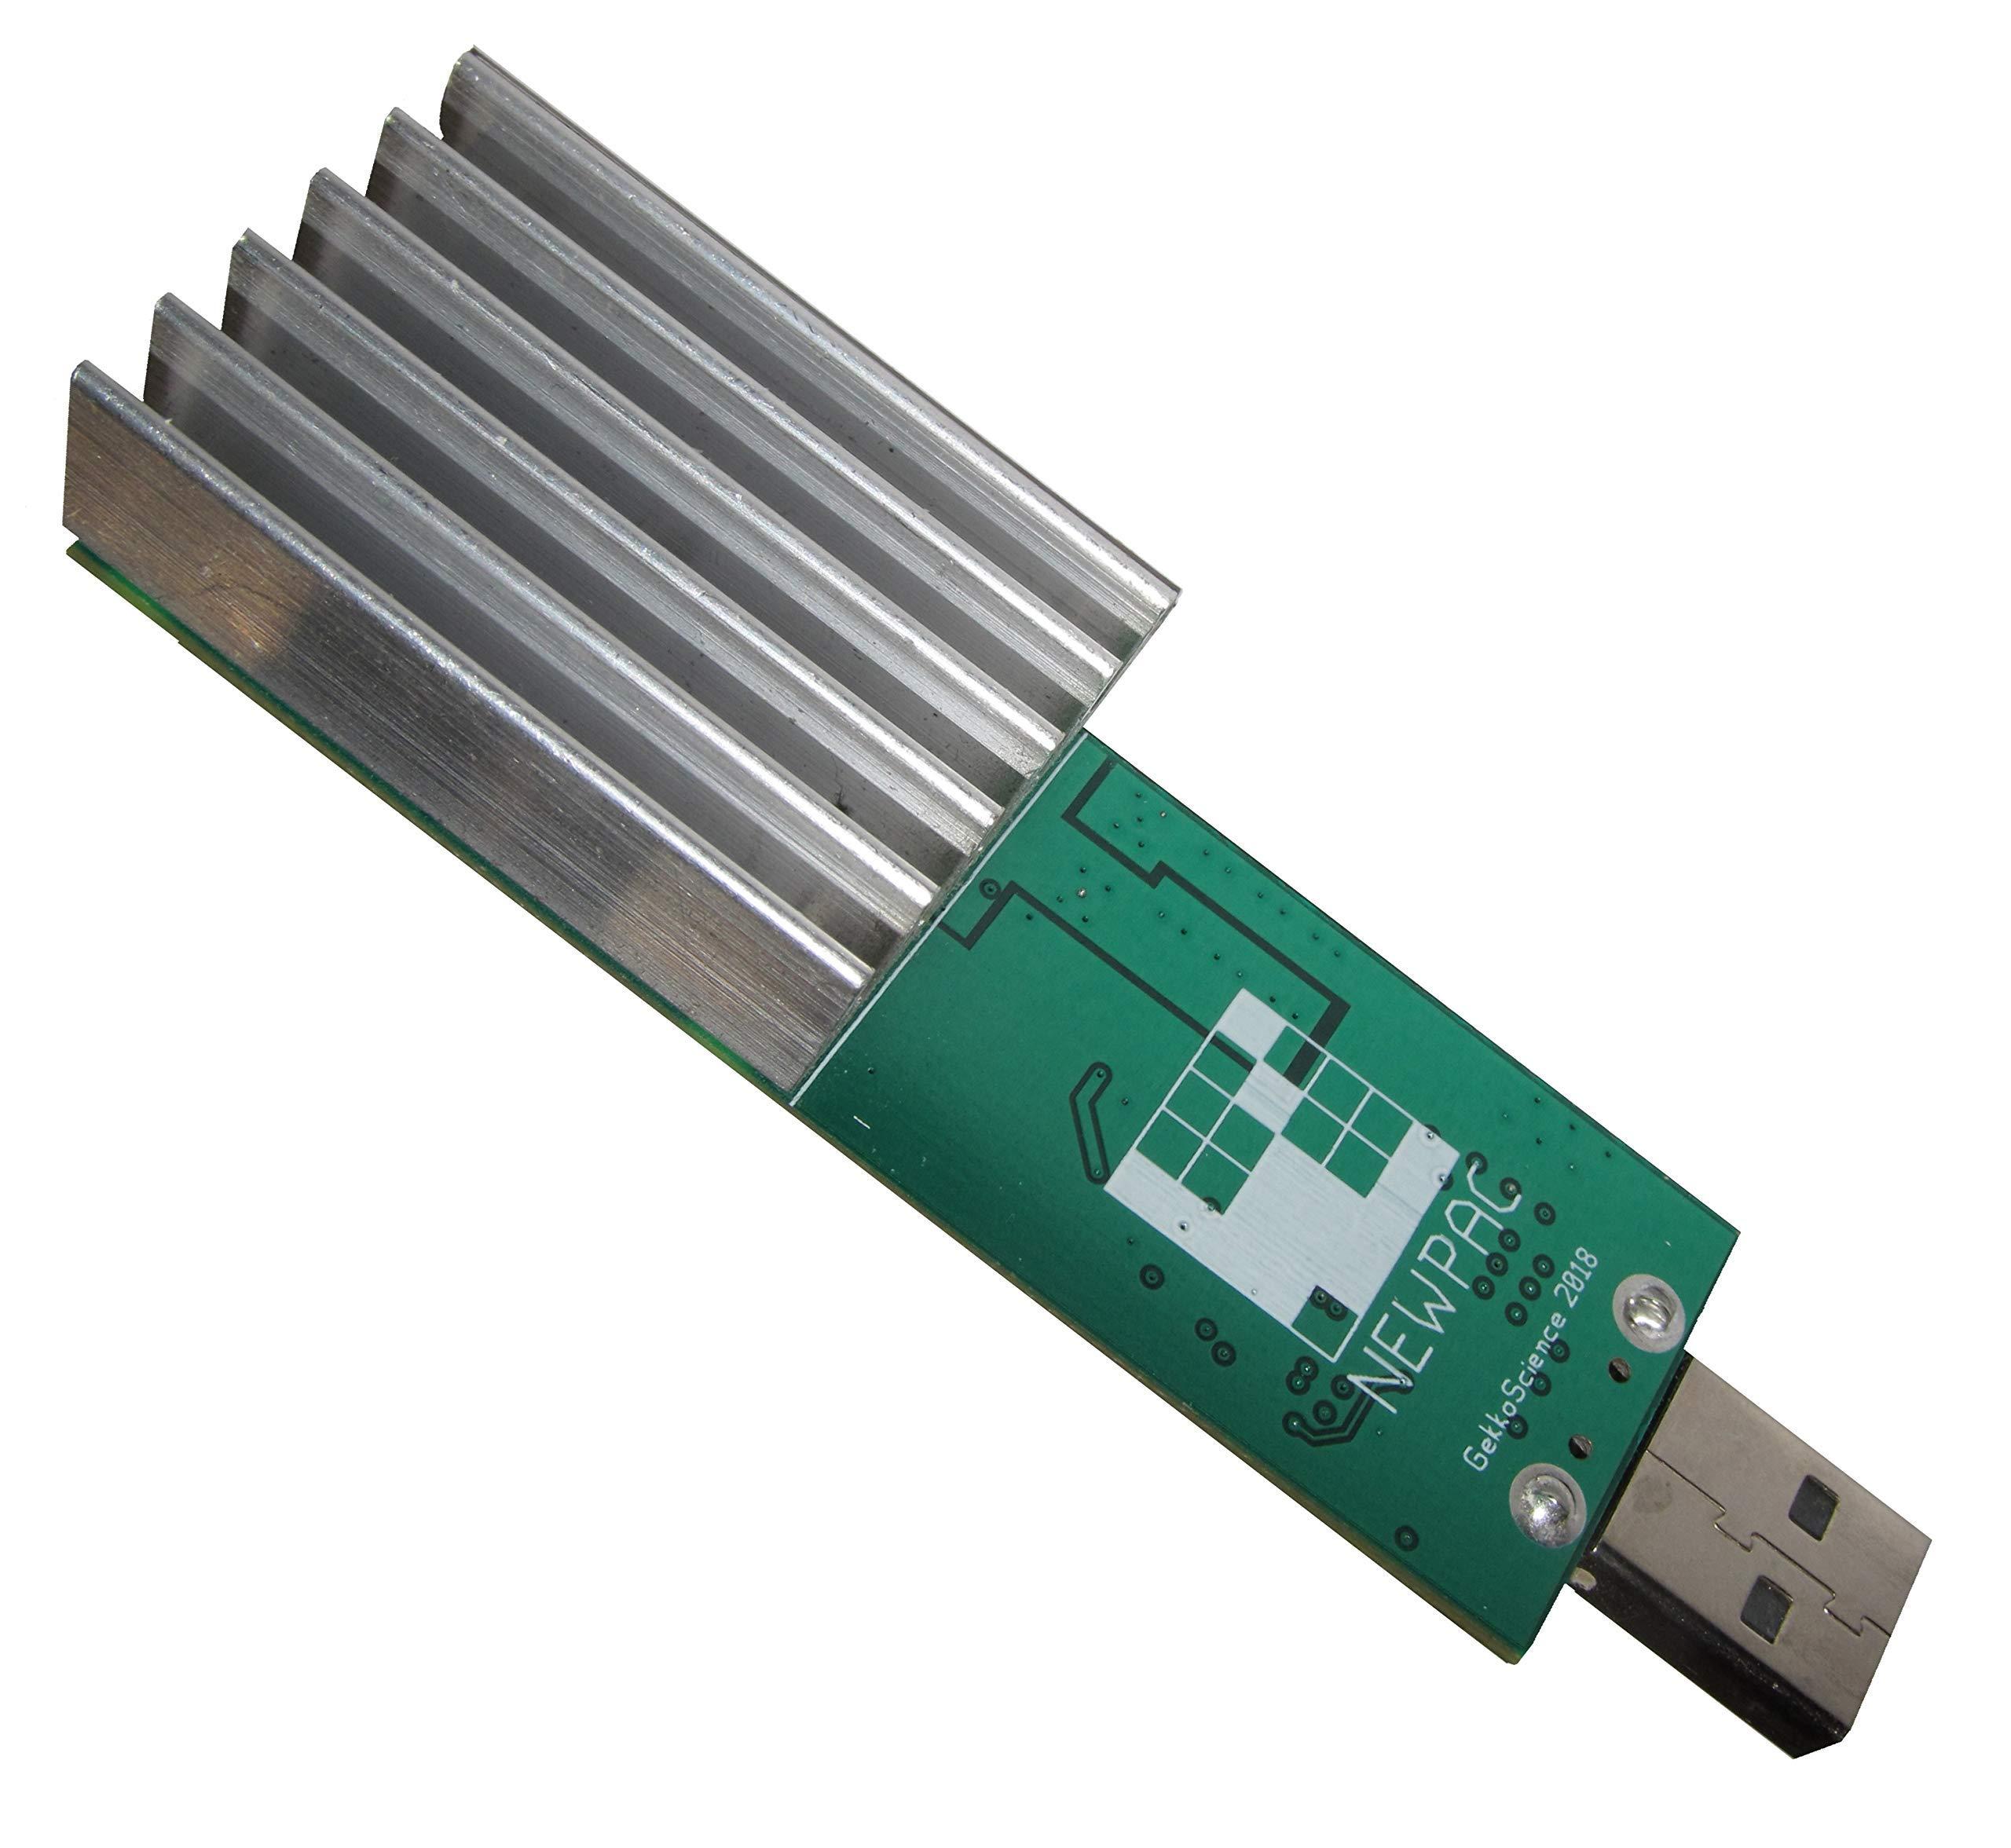 GekkoScience NewPac 130Gh/s+ USB Bitcoin / SHA256 Stick Miner ▪ Most Efficient, Powerful USB Miner on Market ▪ Mine Almost Any Crypto on Multi-Pool